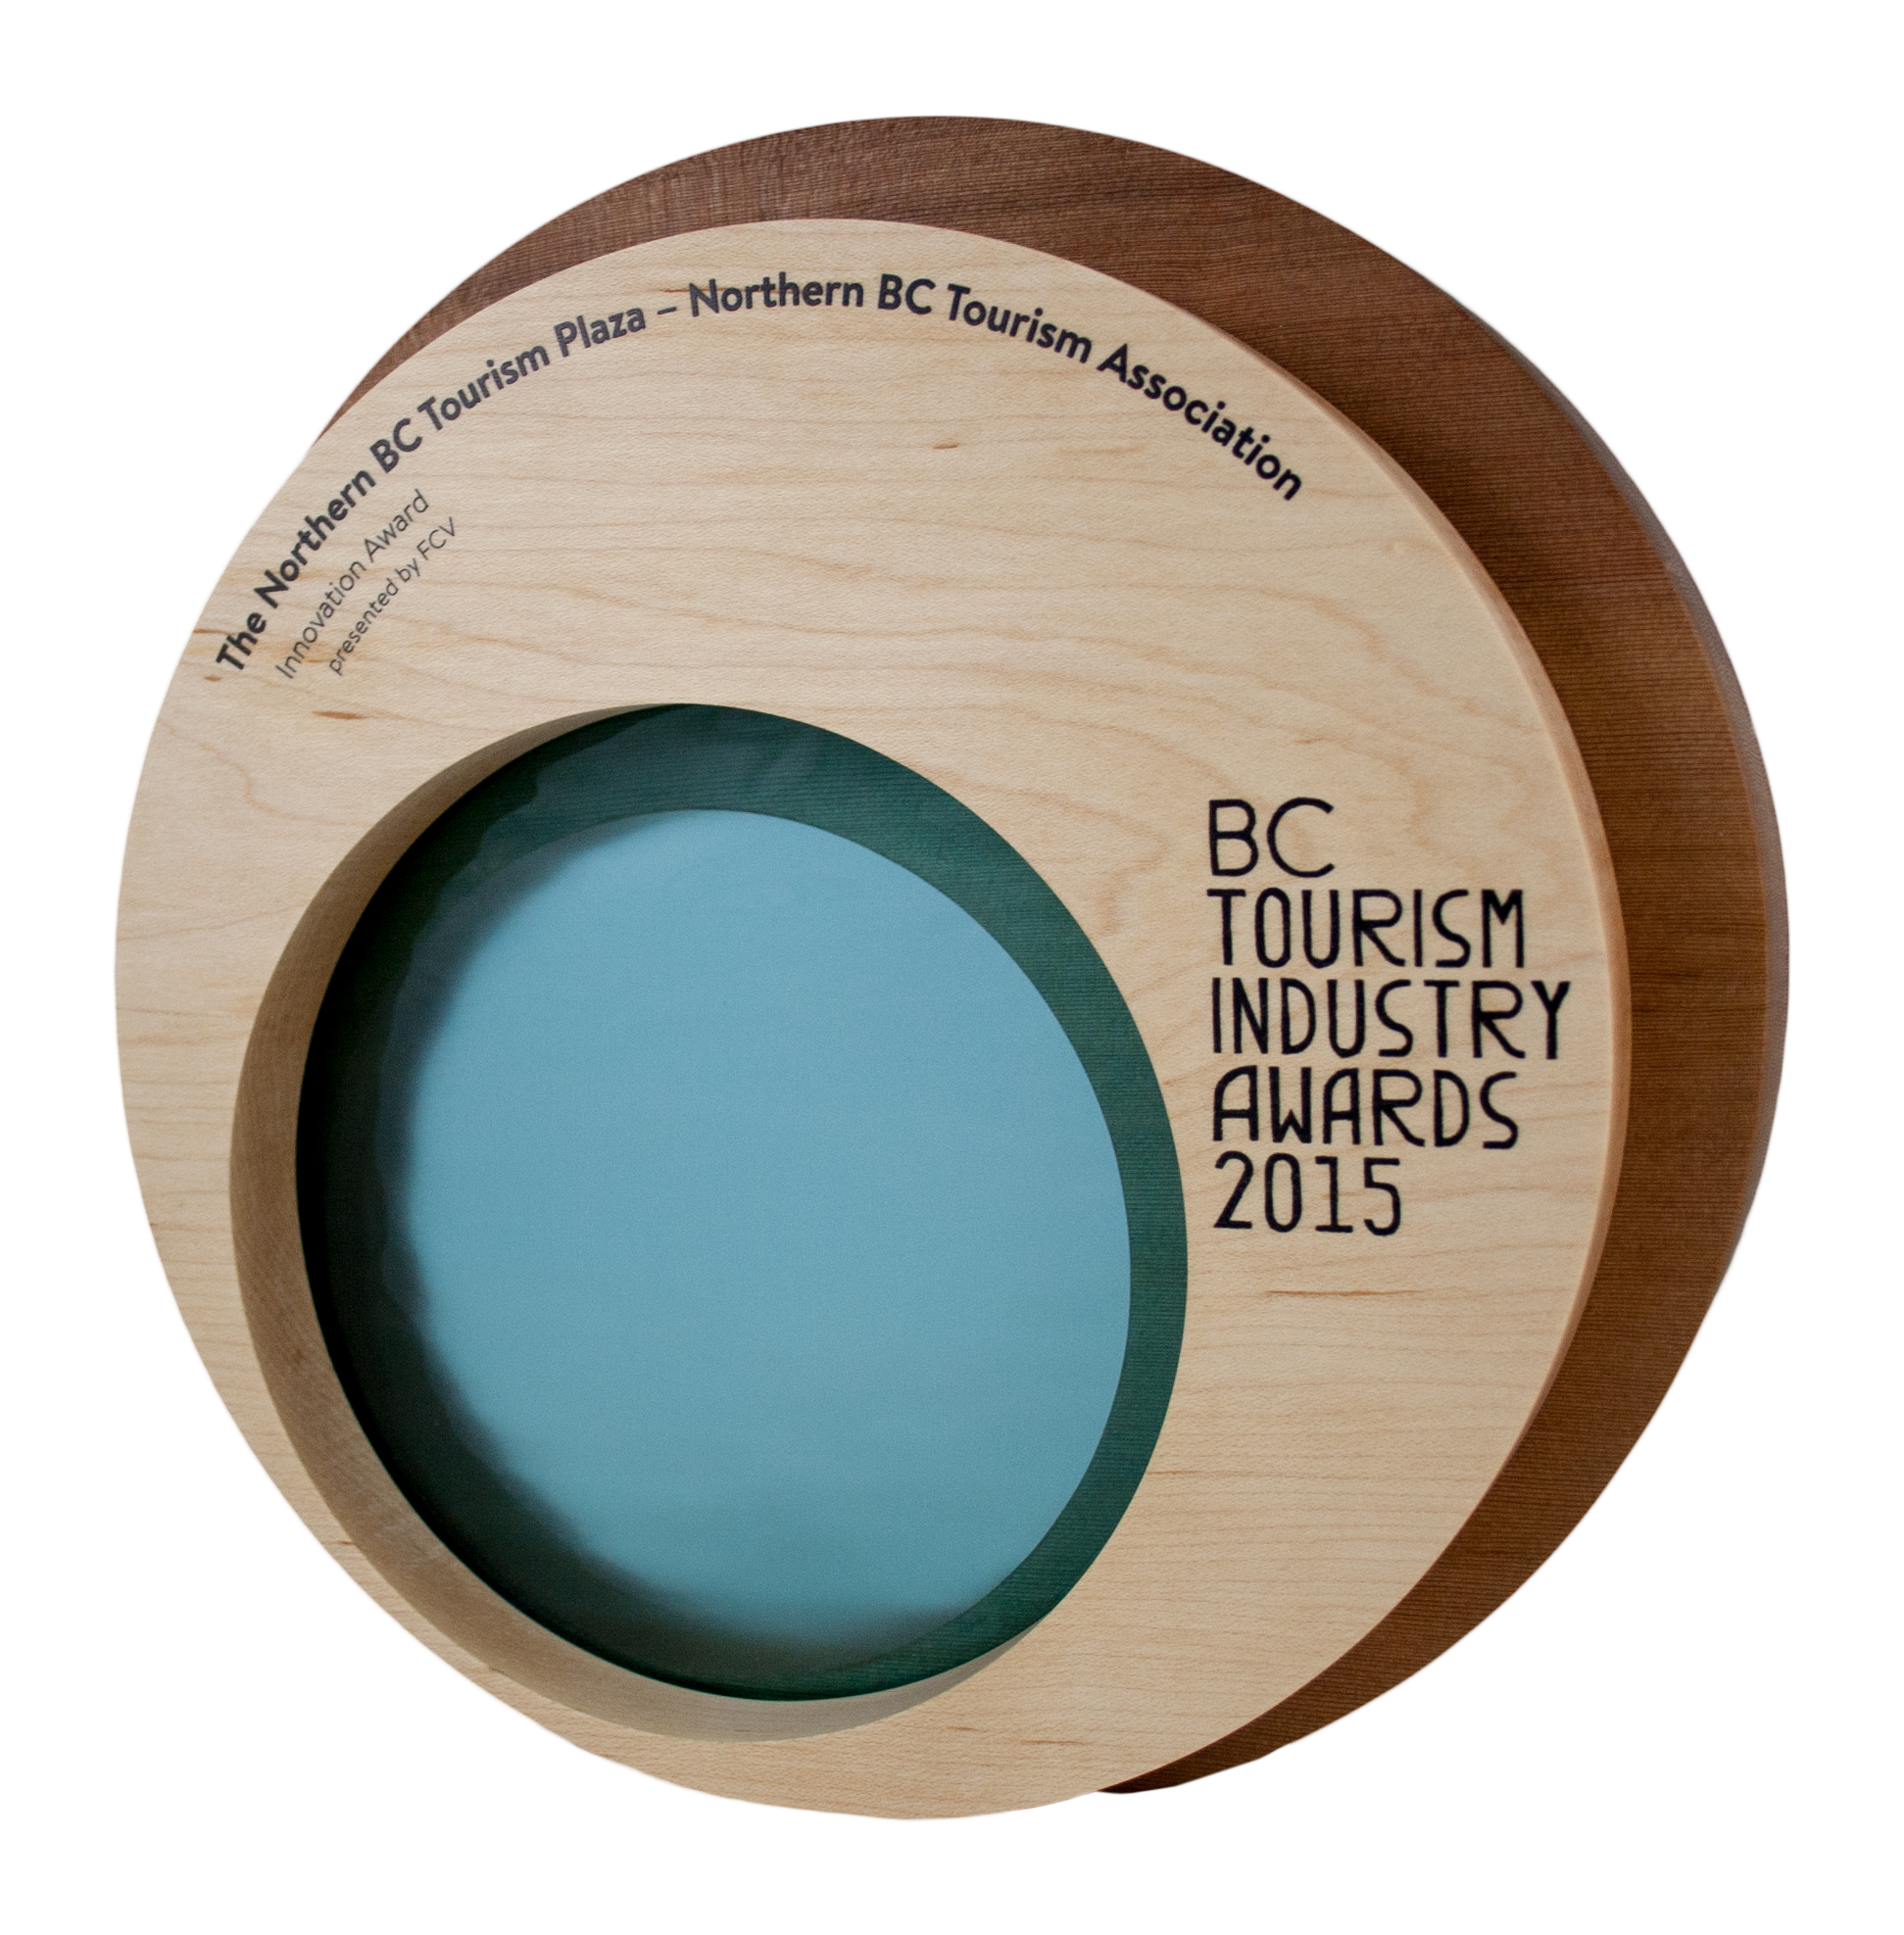 bc-tourism-awards-eco-maple-and-cedar-wood-awards-custom-creative-2.jpg